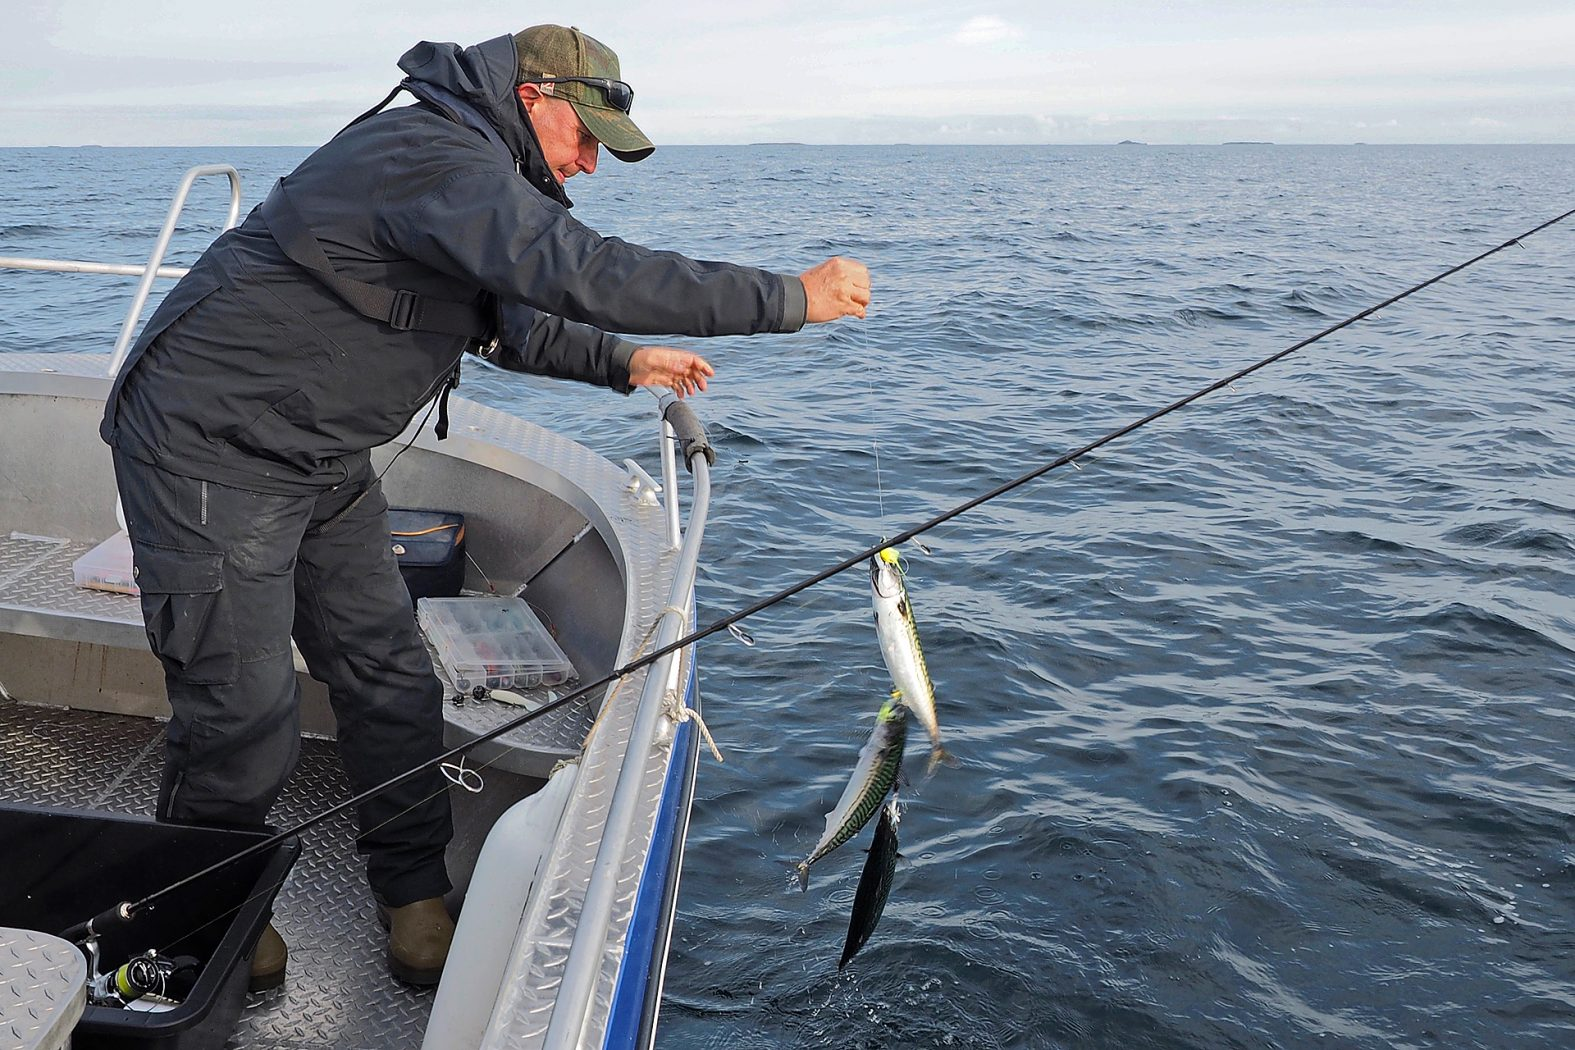 Makrelen angeln in Norwegen